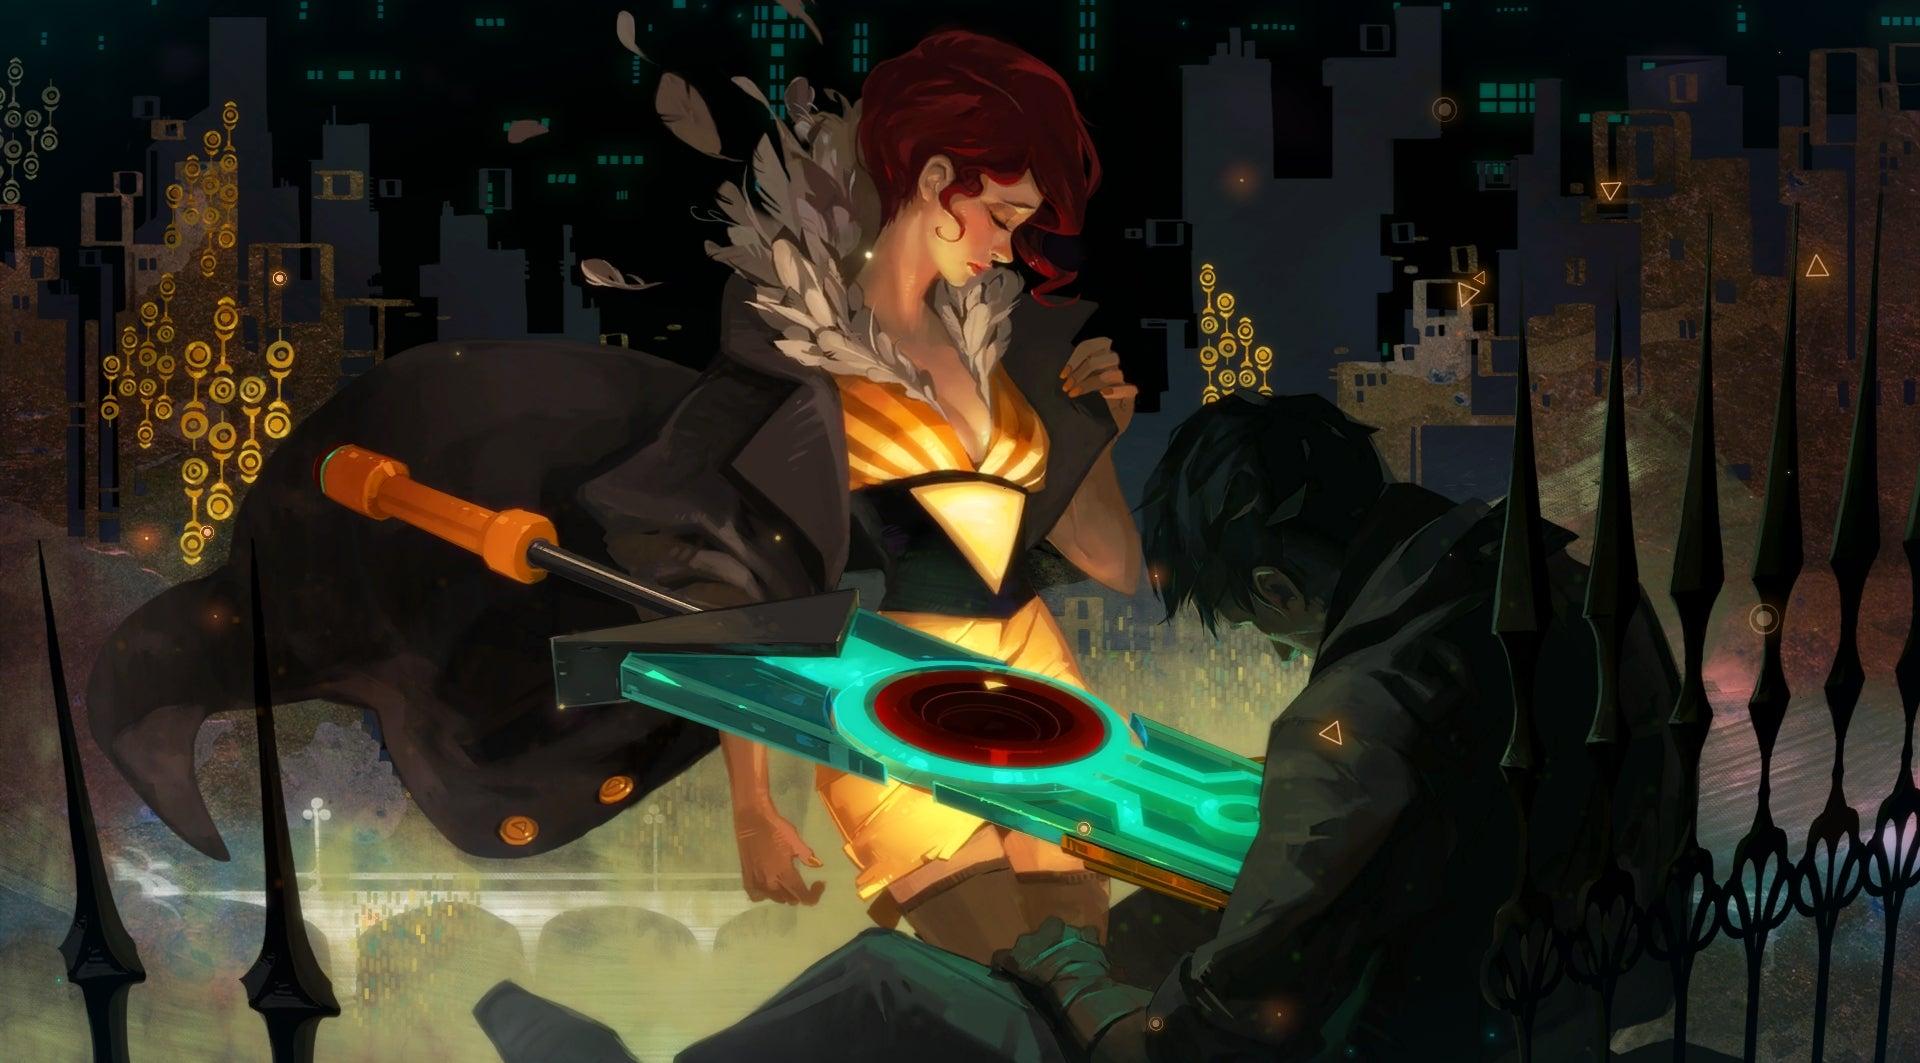 Image for Transistor, Yakuza 4, Thief headline February PS Plus offerings